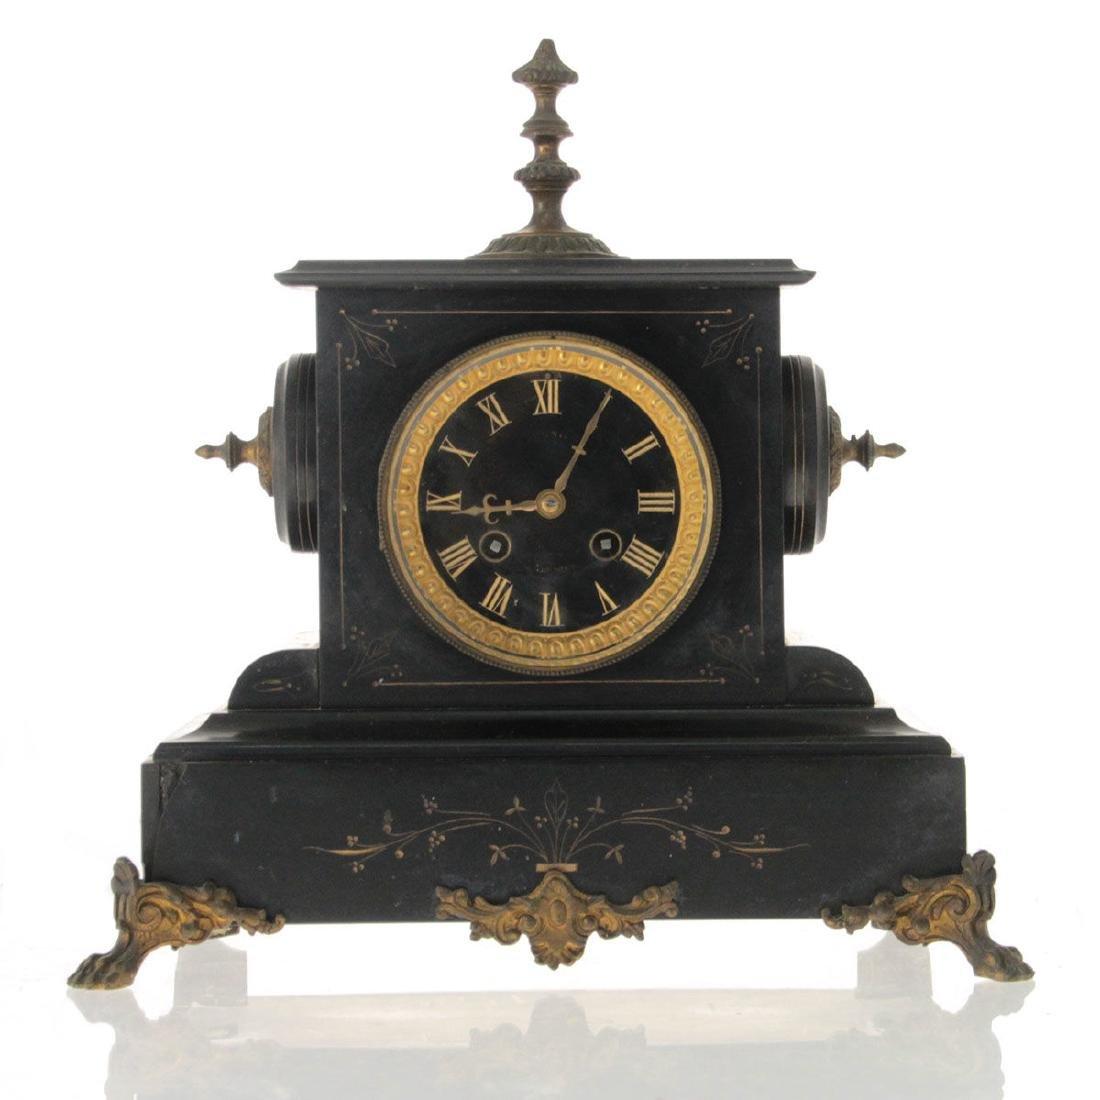 Mantel Clock, France and England, Circa 1880.